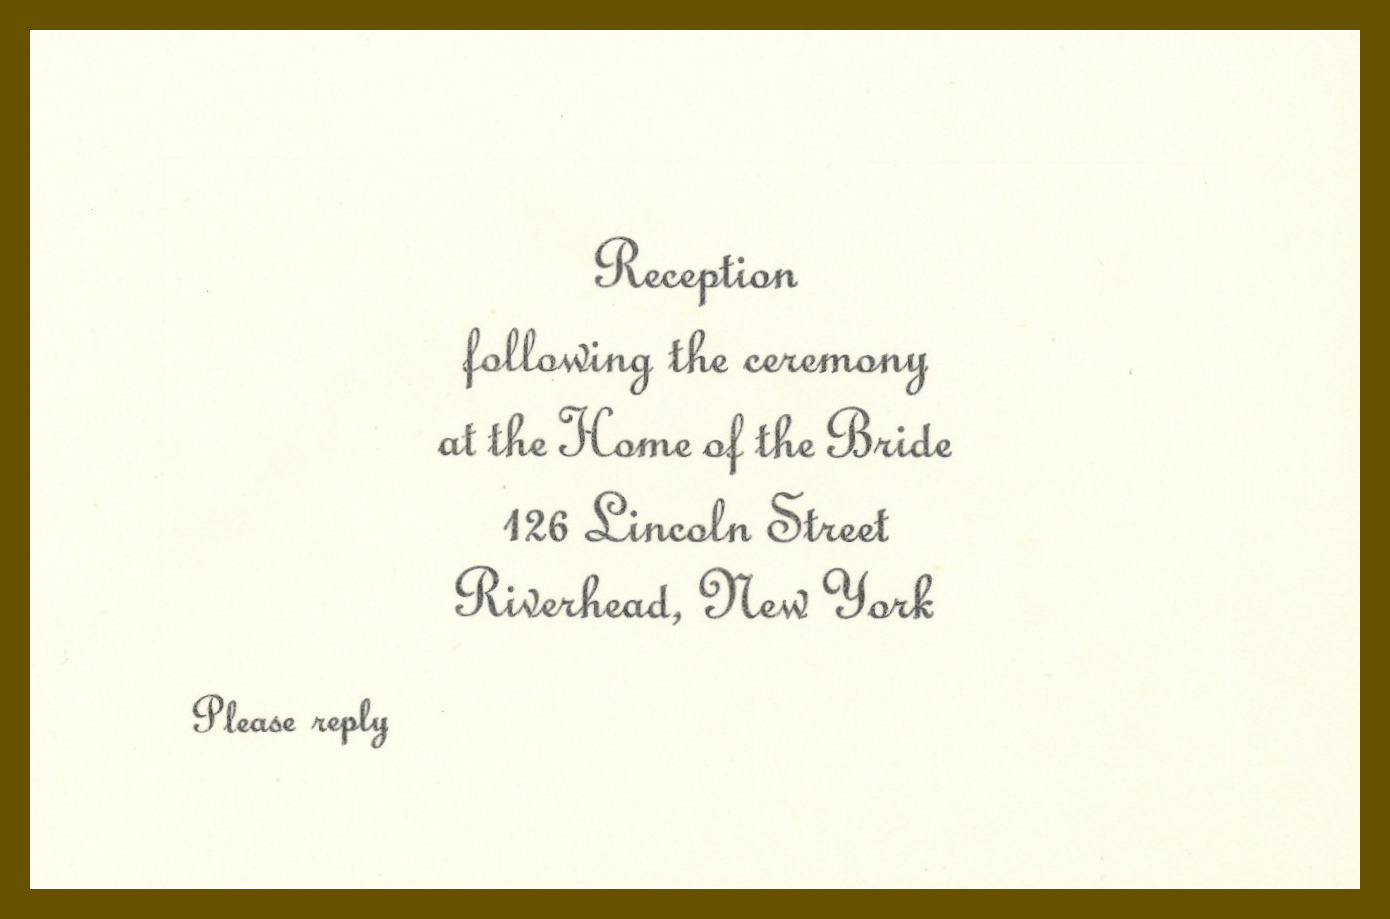 Wedding invitations letter idealstalist wedding invitations letter stopboris Choice Image